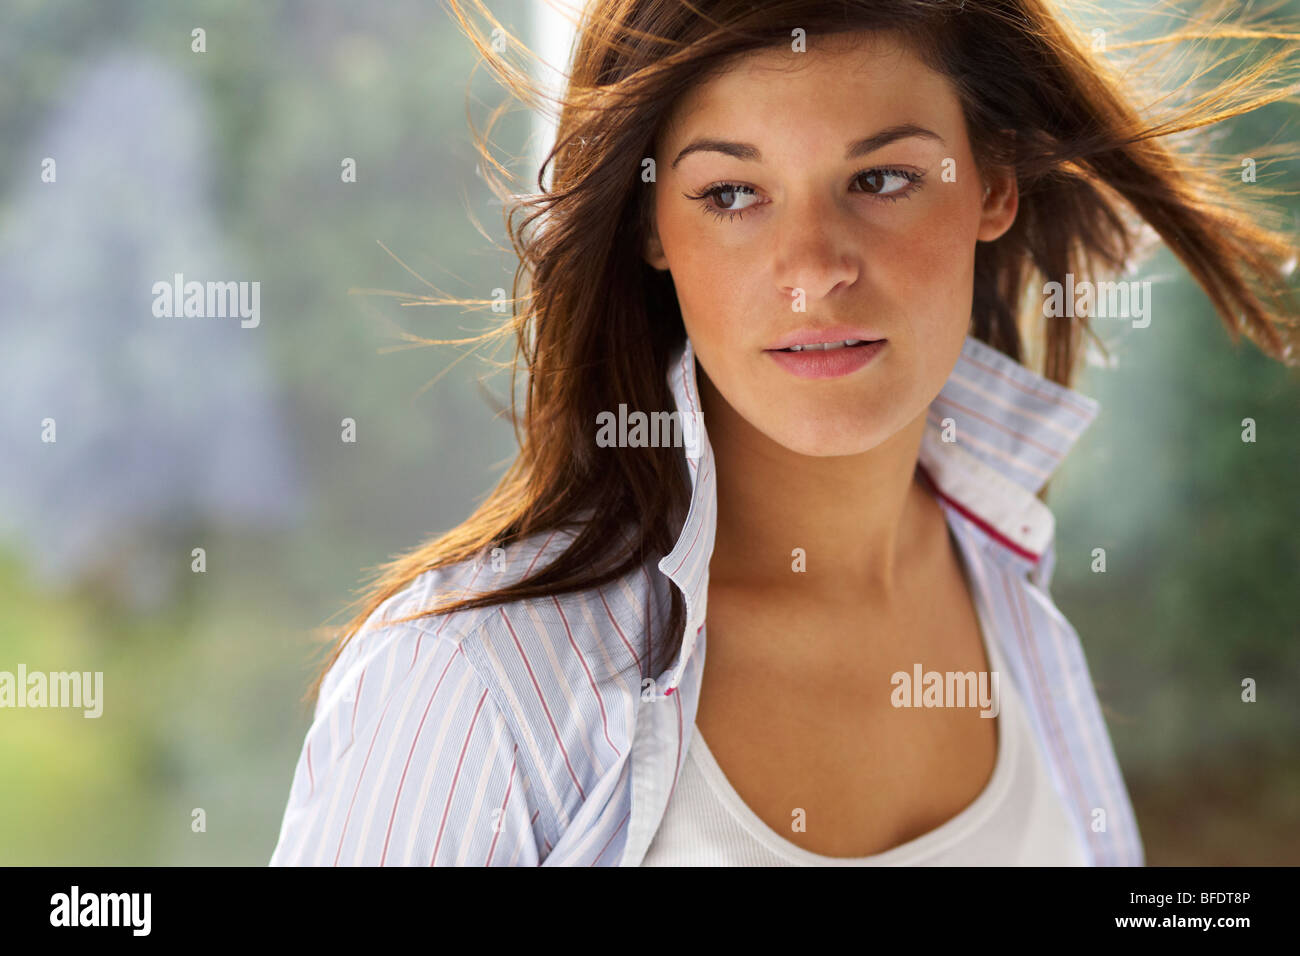 Thoughtful woman - Stock Image